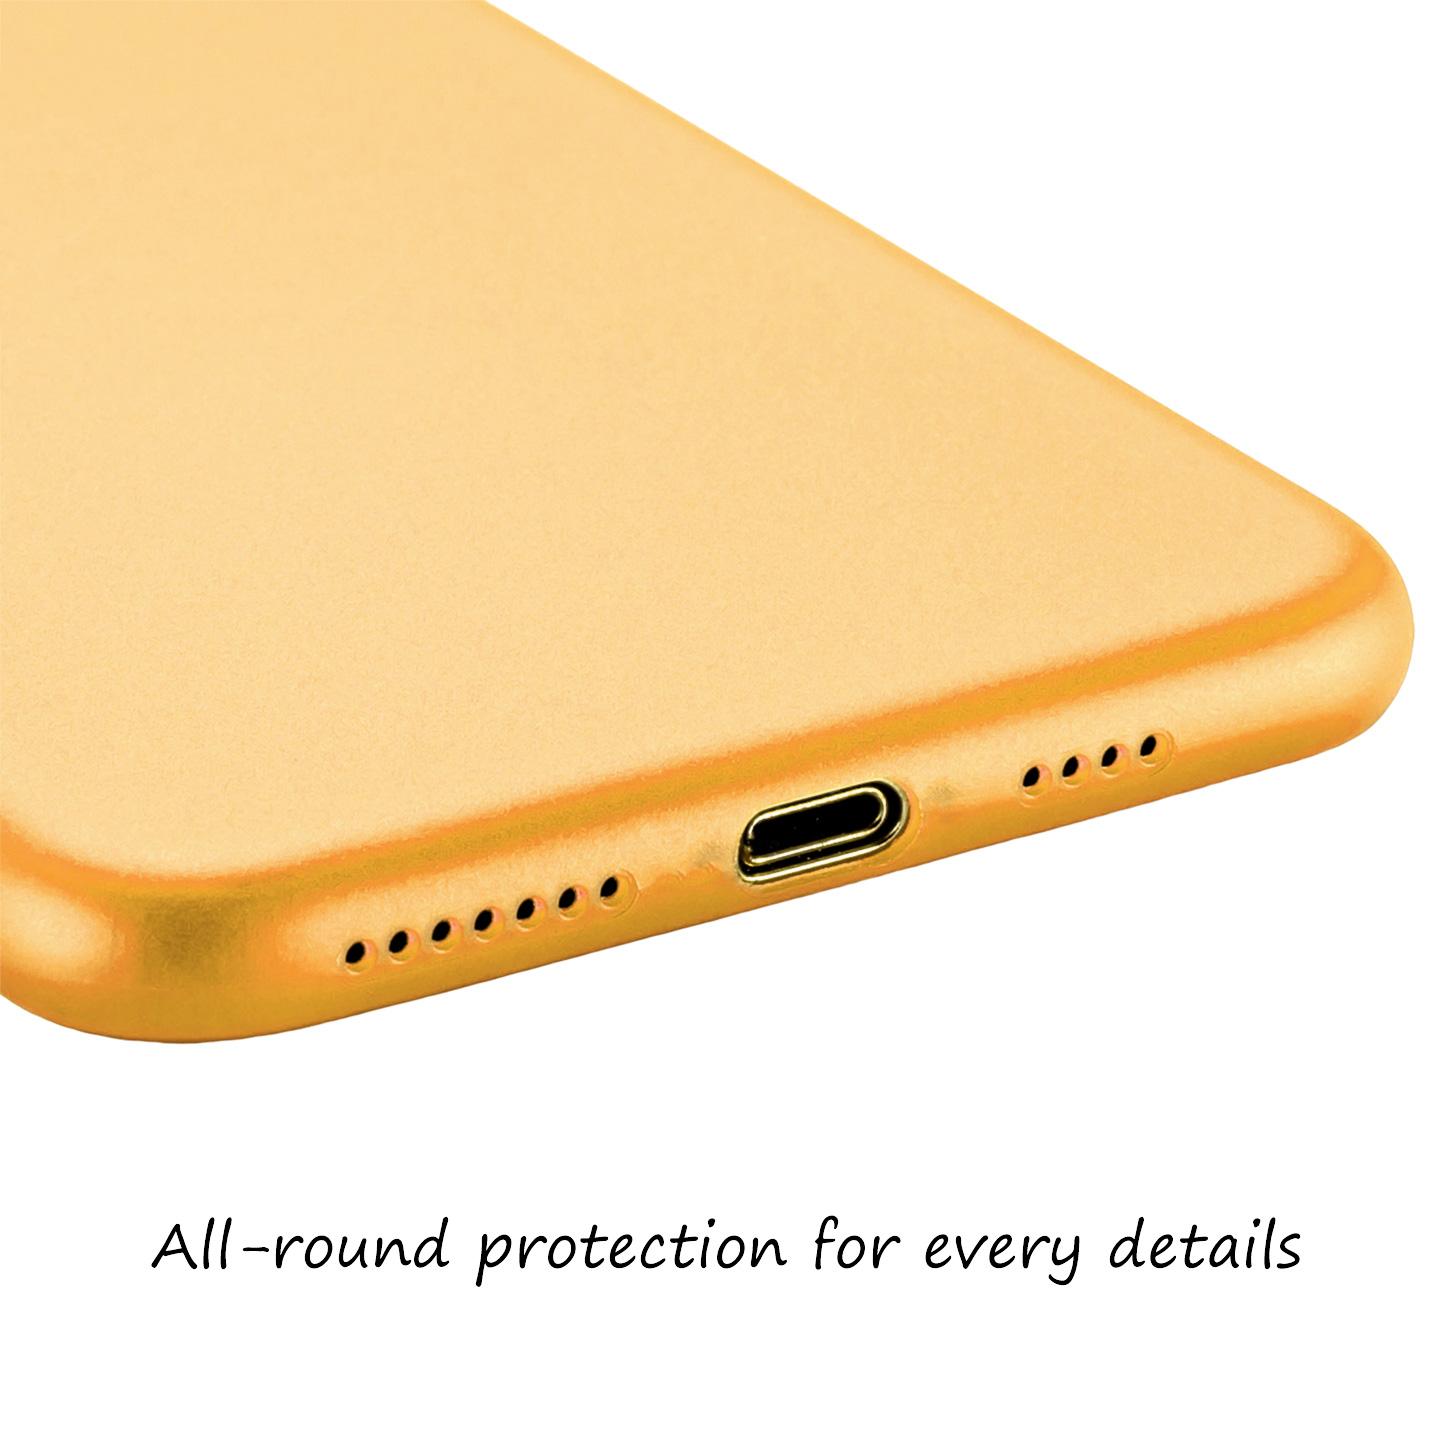 Ultra-Slim-Case-iPhone-11-Pro-5-8-034-Matt-Clear-Schutz-Huelle-Skin-Cover-Etui-Folie Indexbild 44